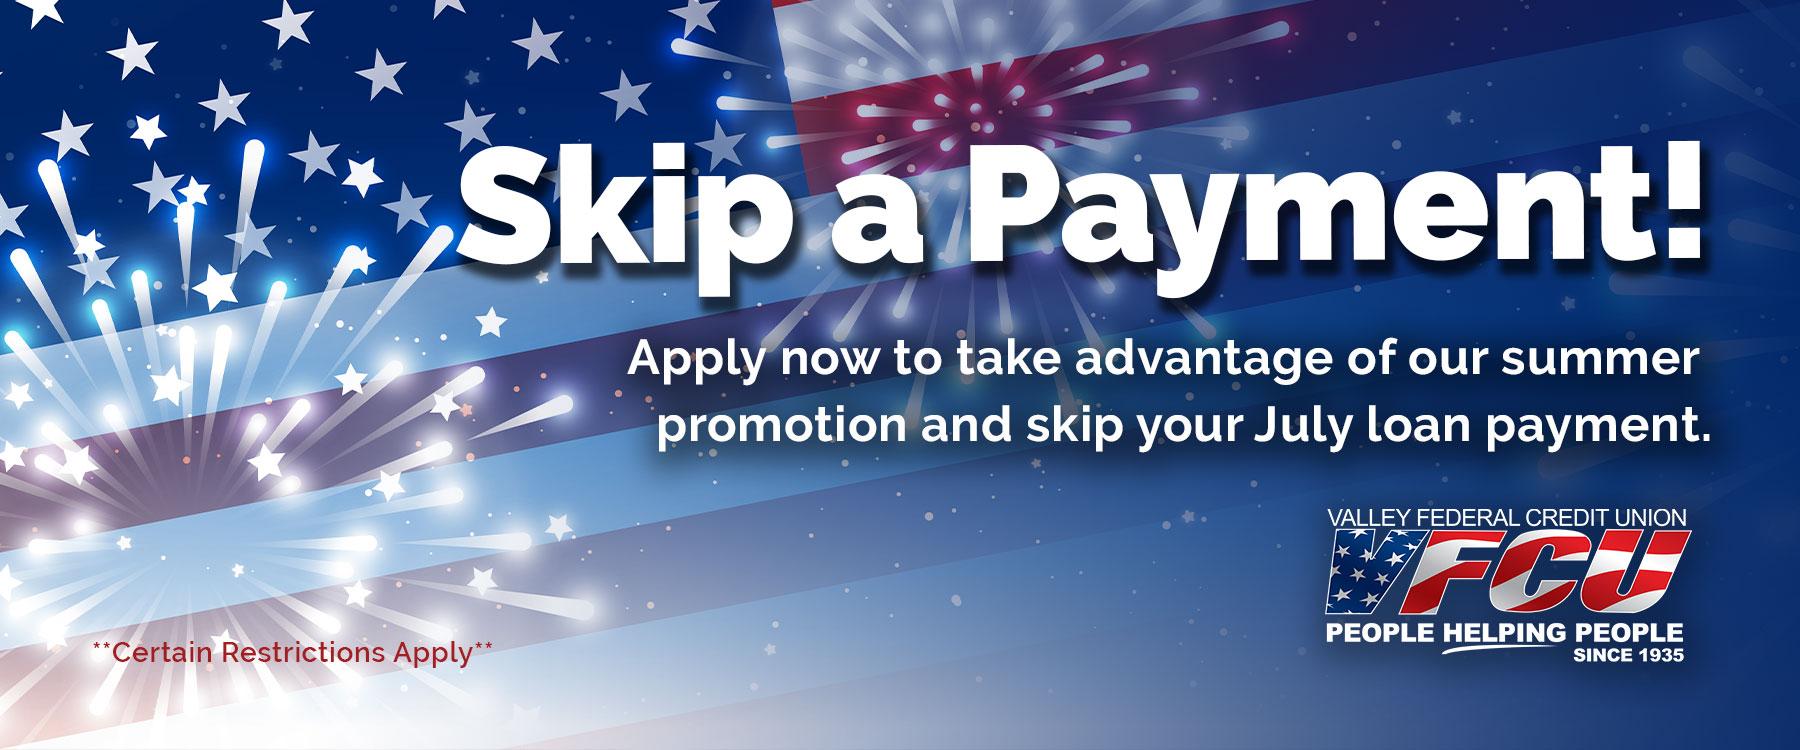 Skip a Payment promotion